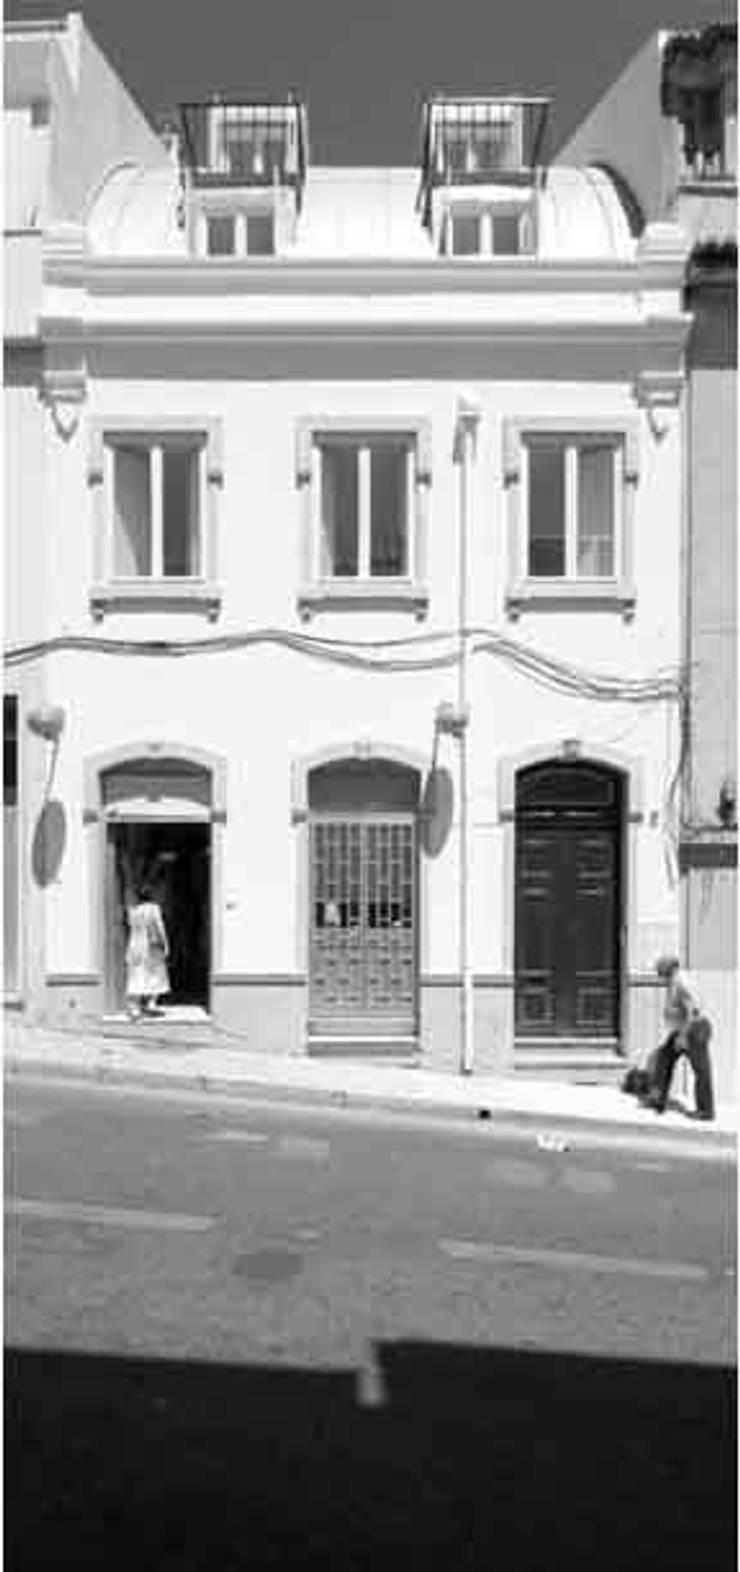 facade 04:   por ARTE e TECTóNiCA, arquitectura e desenho Lda